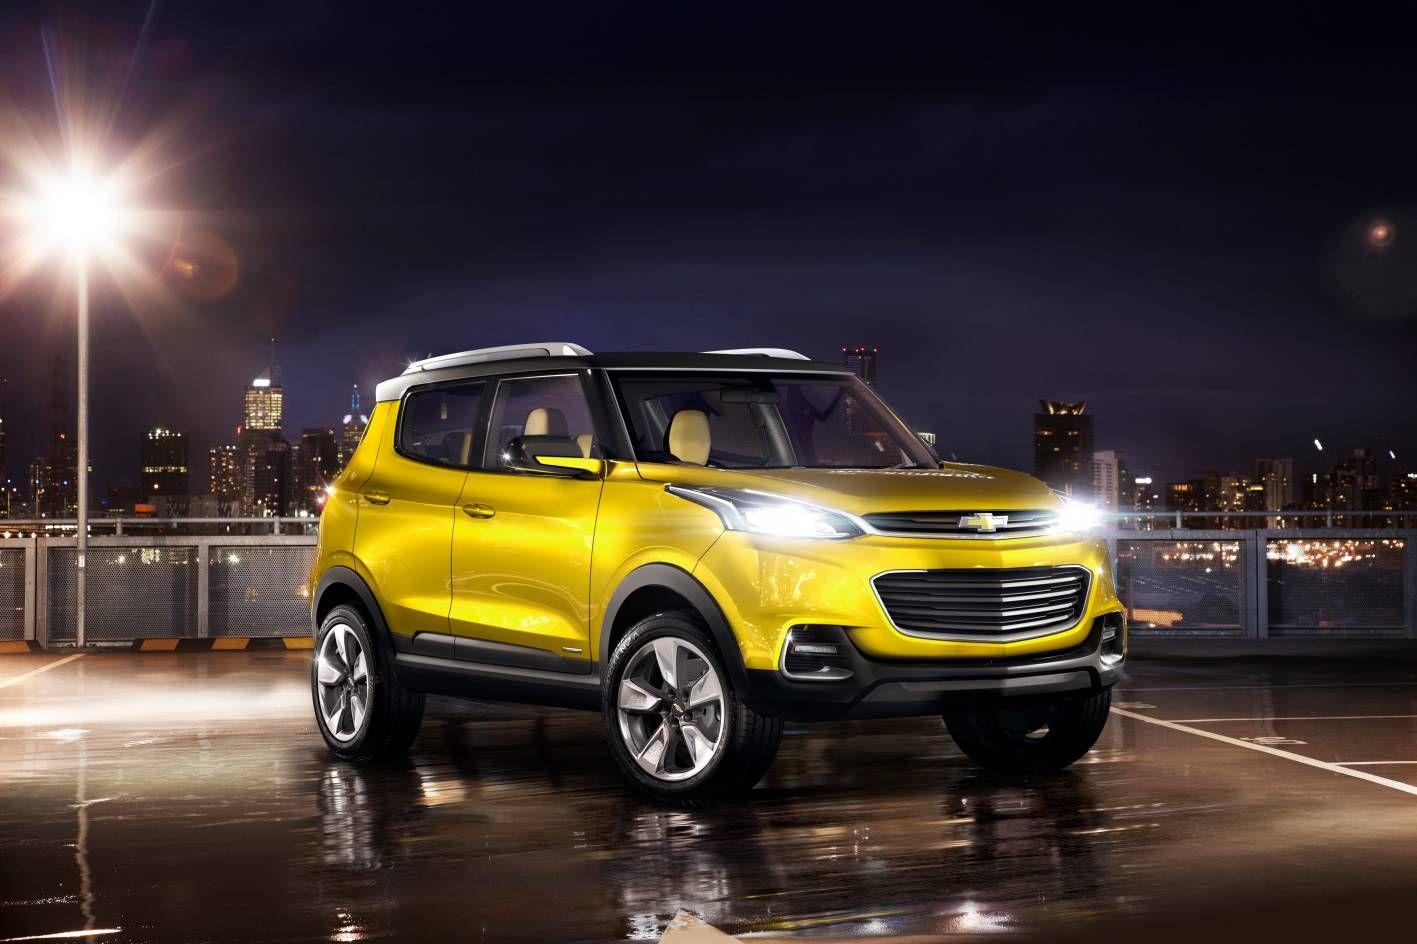 Chevrolet Cars News Chevrolet Adra small SUV for India